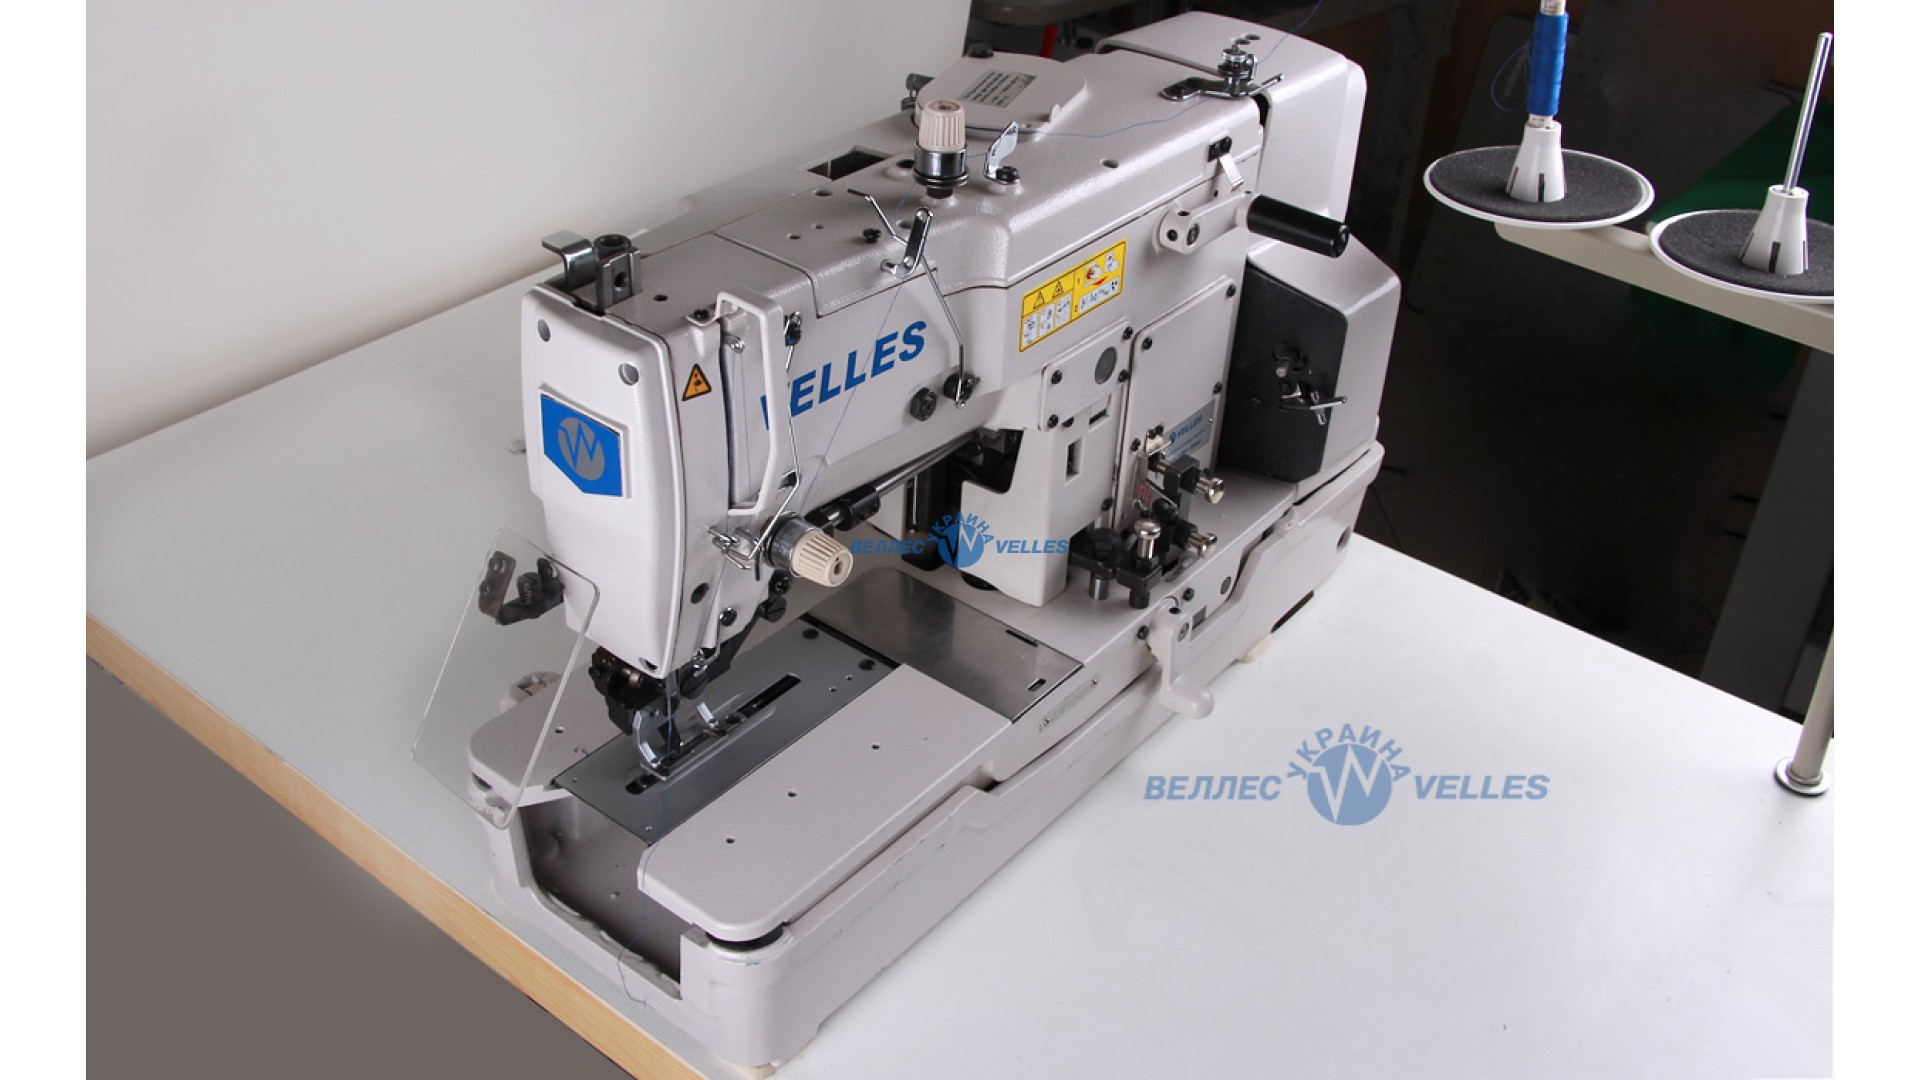 Velles vbh 580u мягкий глаз игрушка